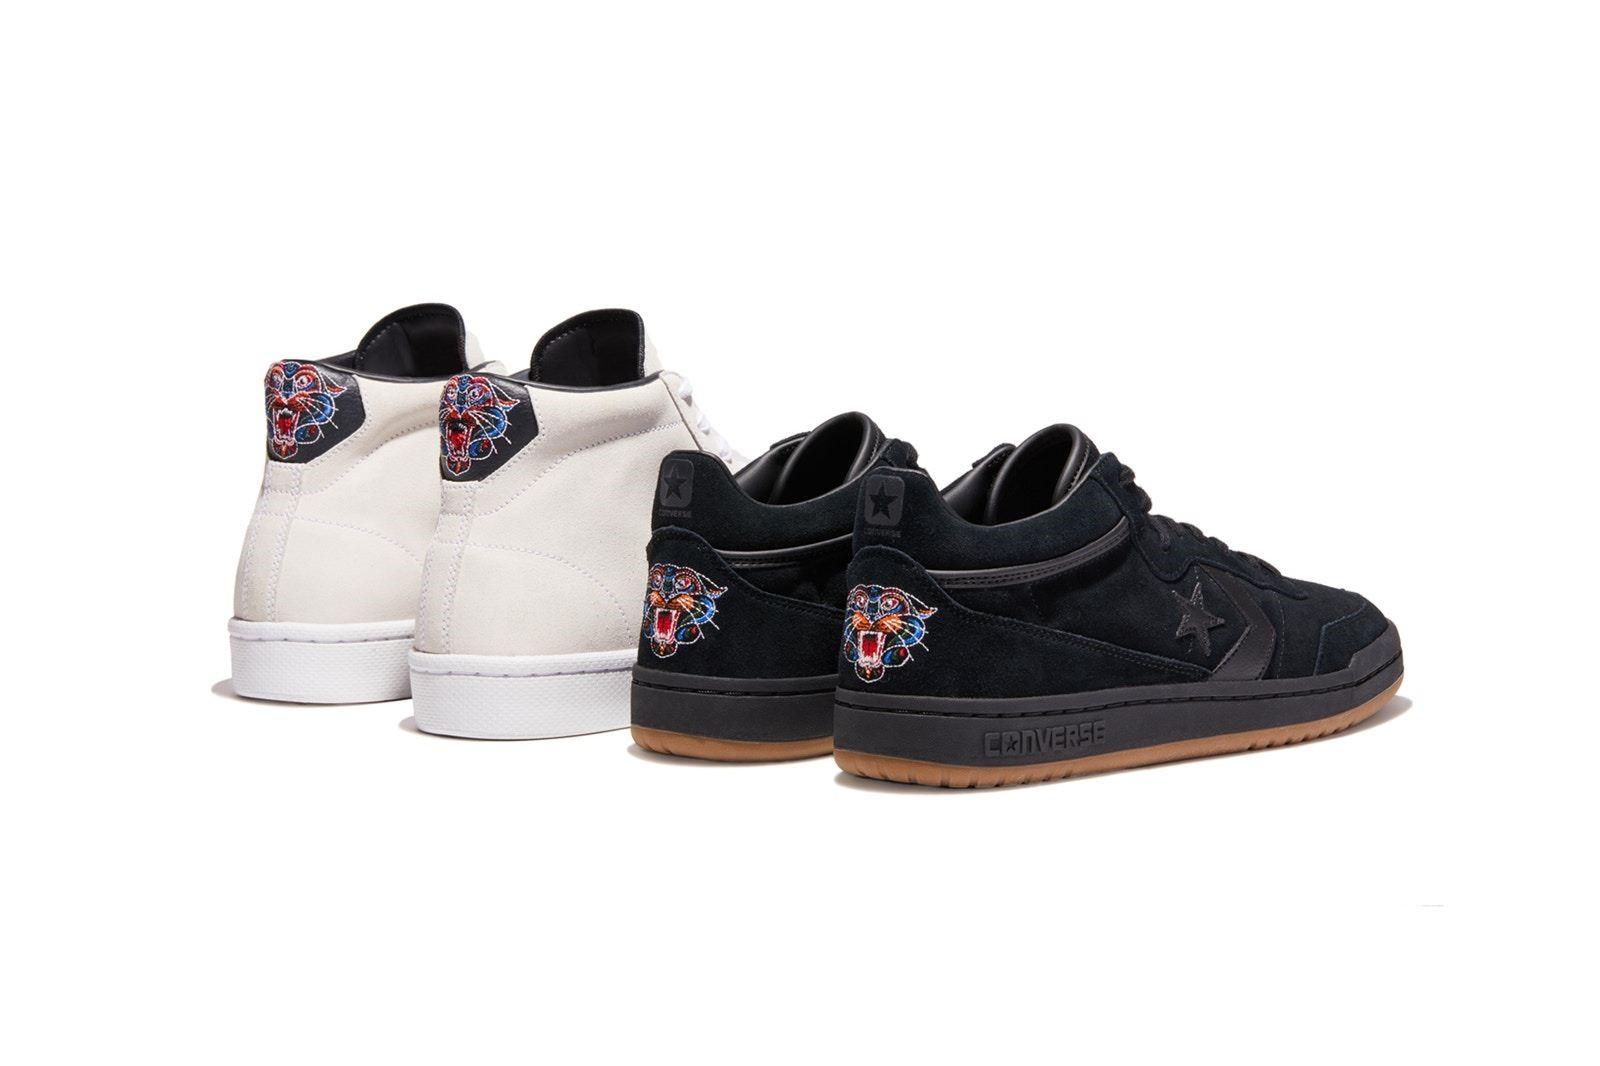 "d82a4e330df7 ... 于Al Davis 的家庭与传统,采用白色和黑色皮革呈现,后跟点缀""豹头""刺绣以及烫金名字缩写""AL D""成为亮点。鞋款将于今日发售,售价分别为 85美元和90美元。"